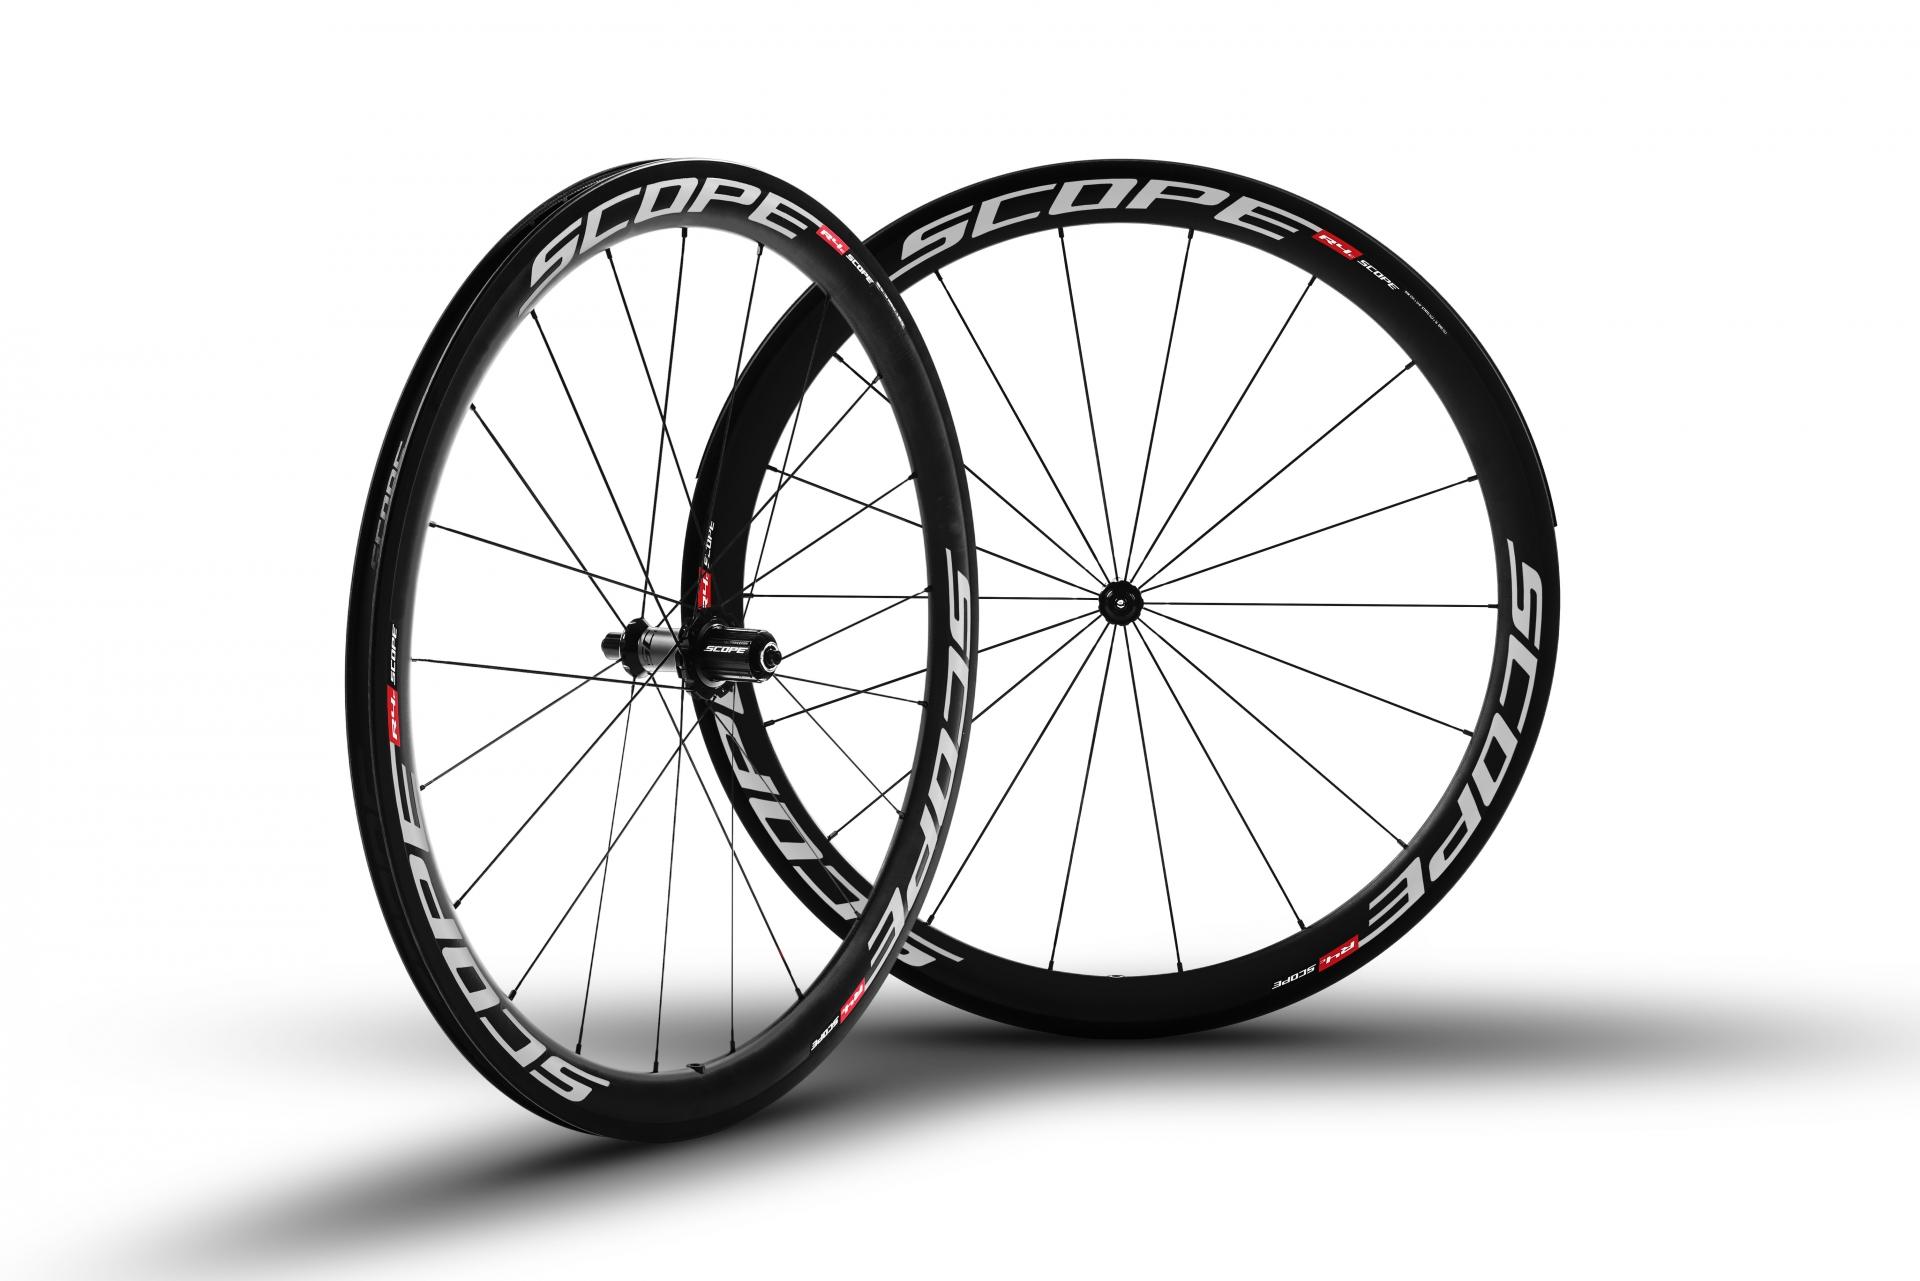 Roues carbone Scope R4c 45 mm pneu Shimano 11V Blanc